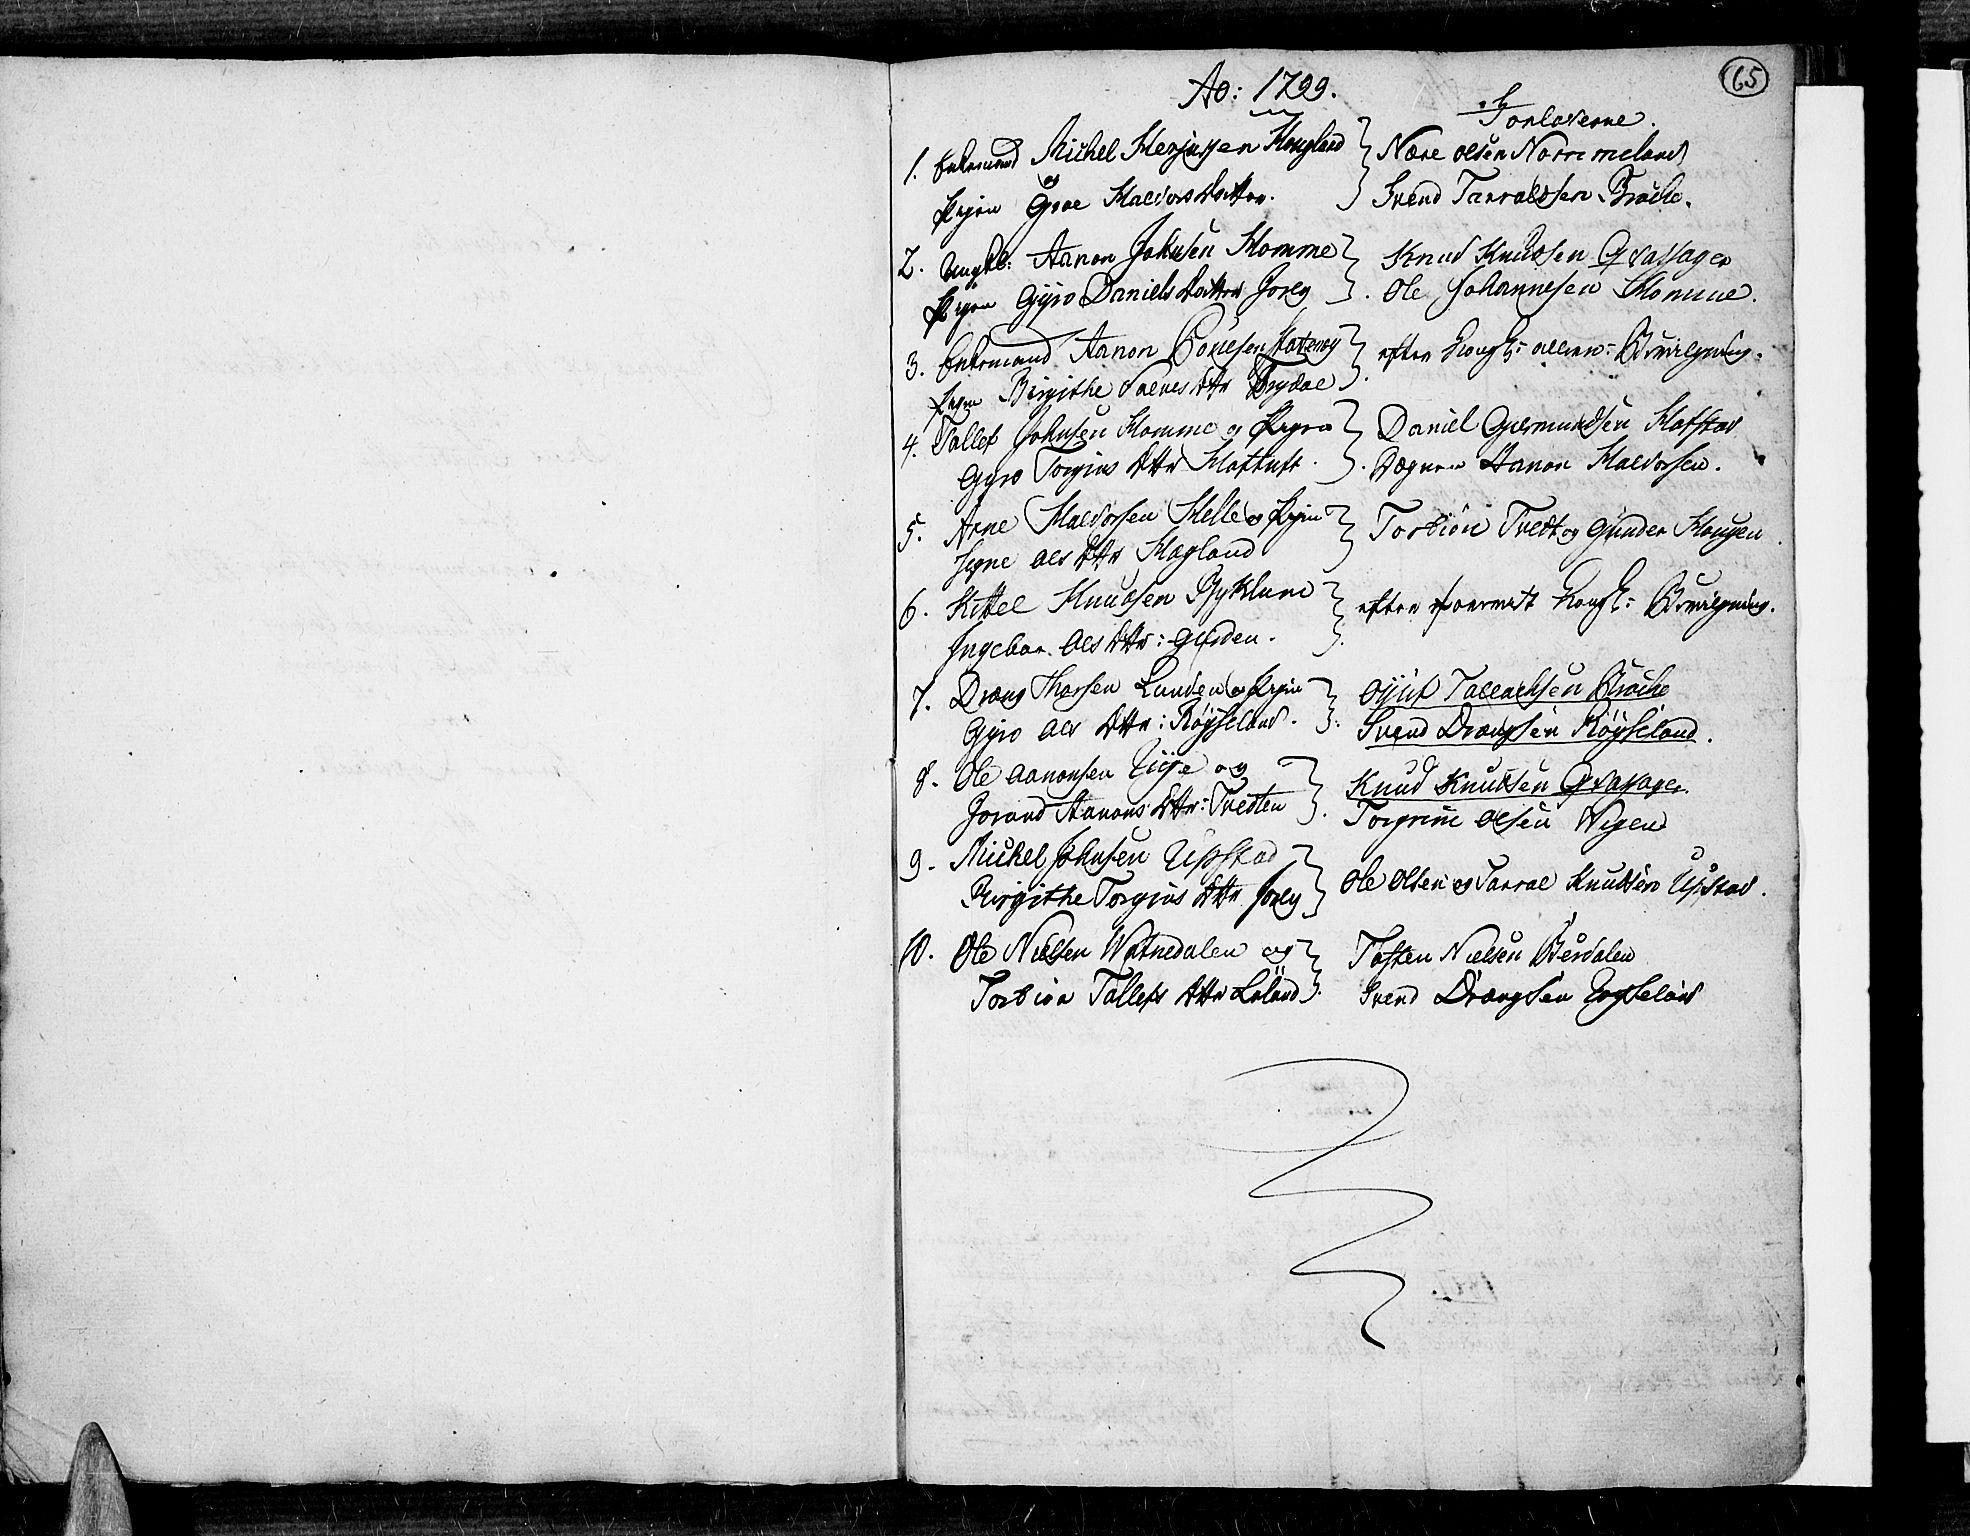 SAK, Valle sokneprestkontor, F/Fa/Fac/L0003: Ministerialbok nr. A 3, 1776-1790, s. 65